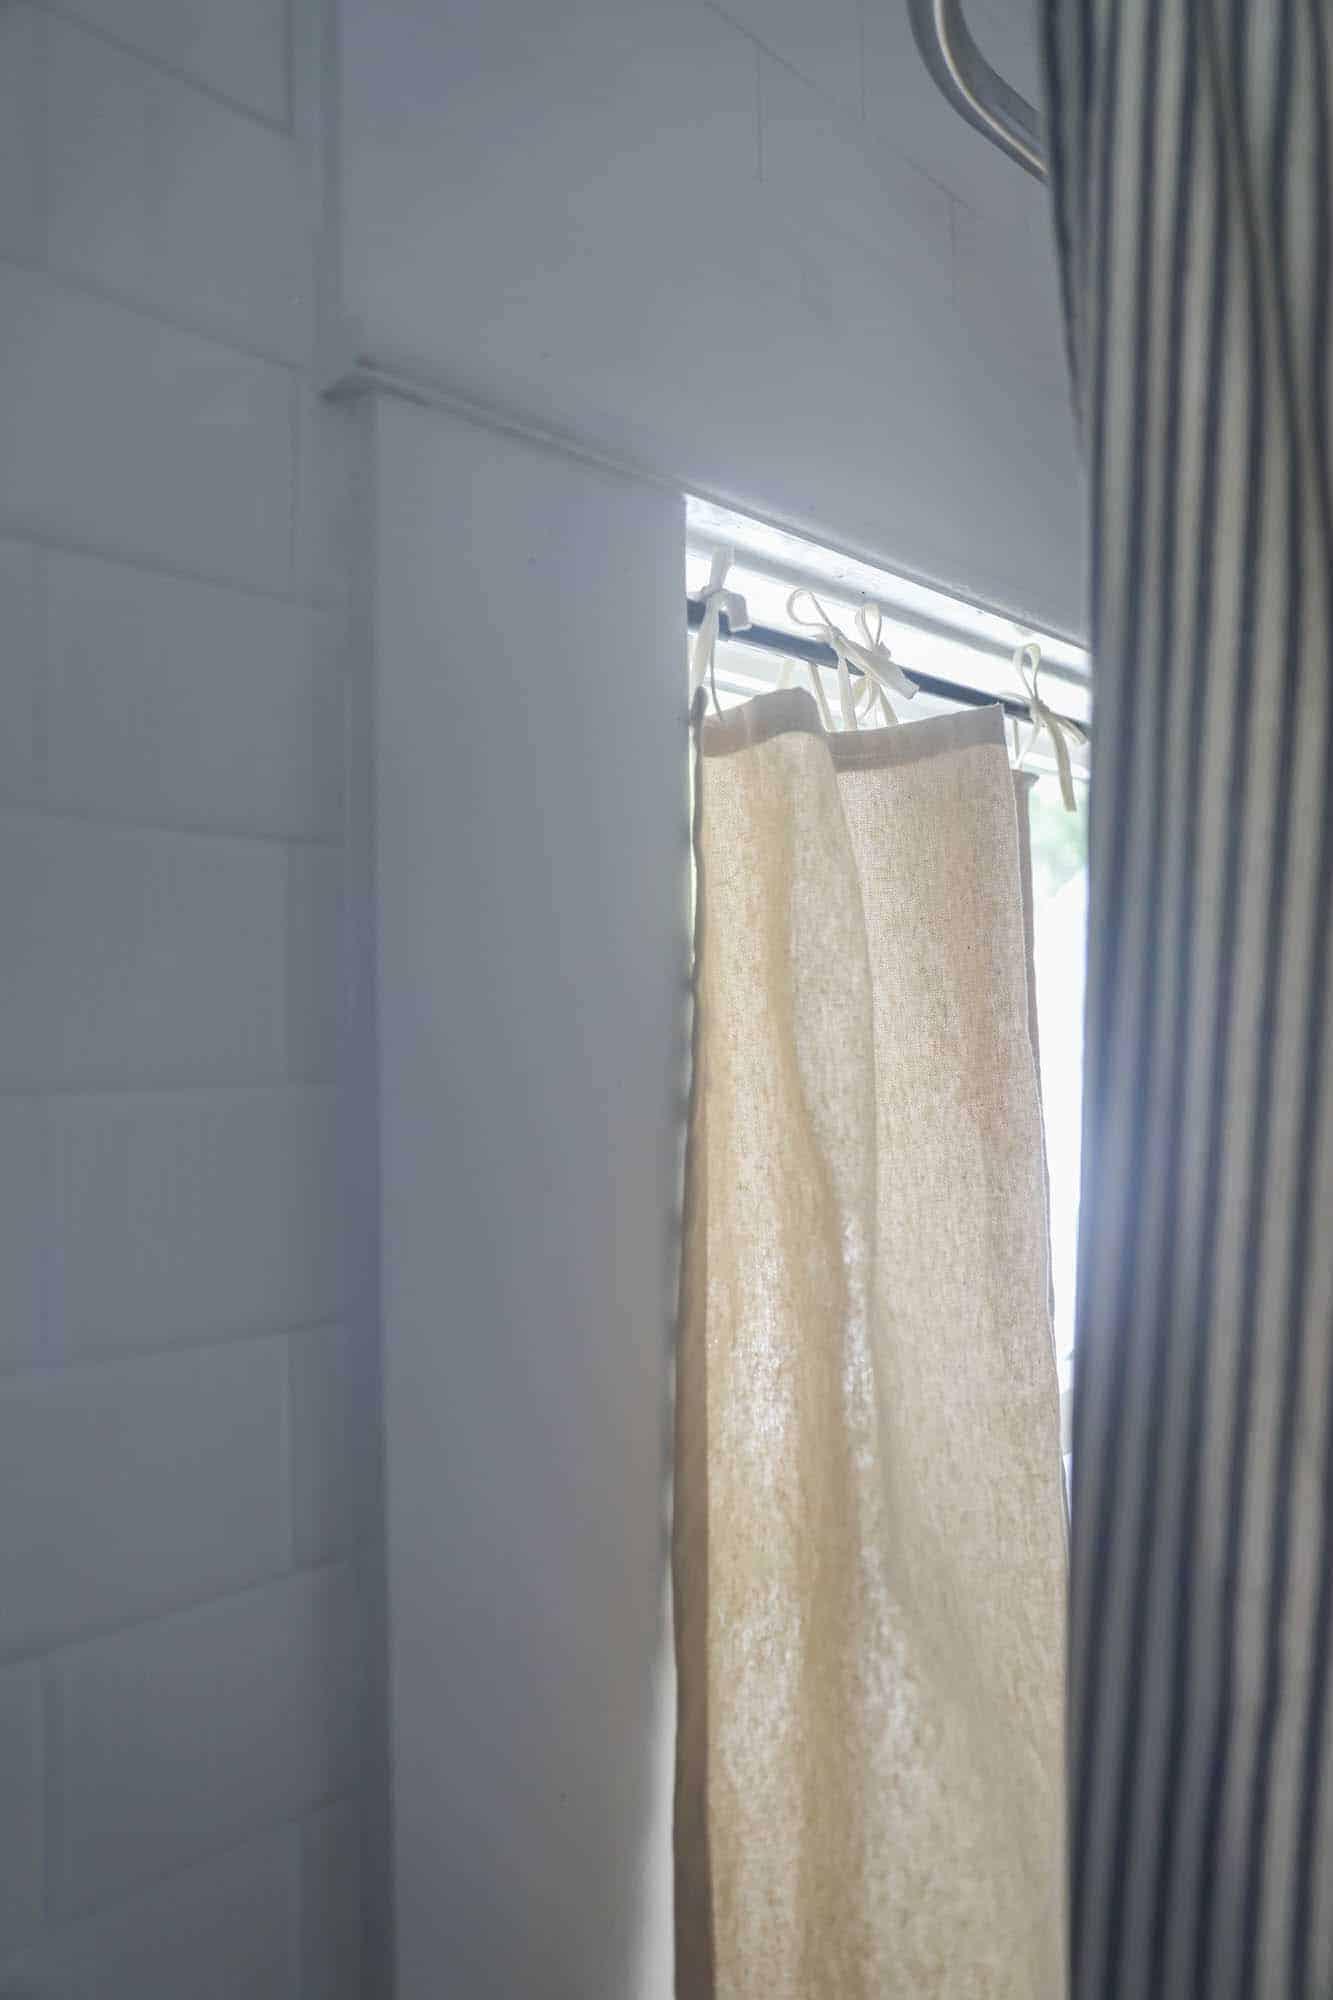 How To Make Drop Cloth Curtains Farmhouse On Boone